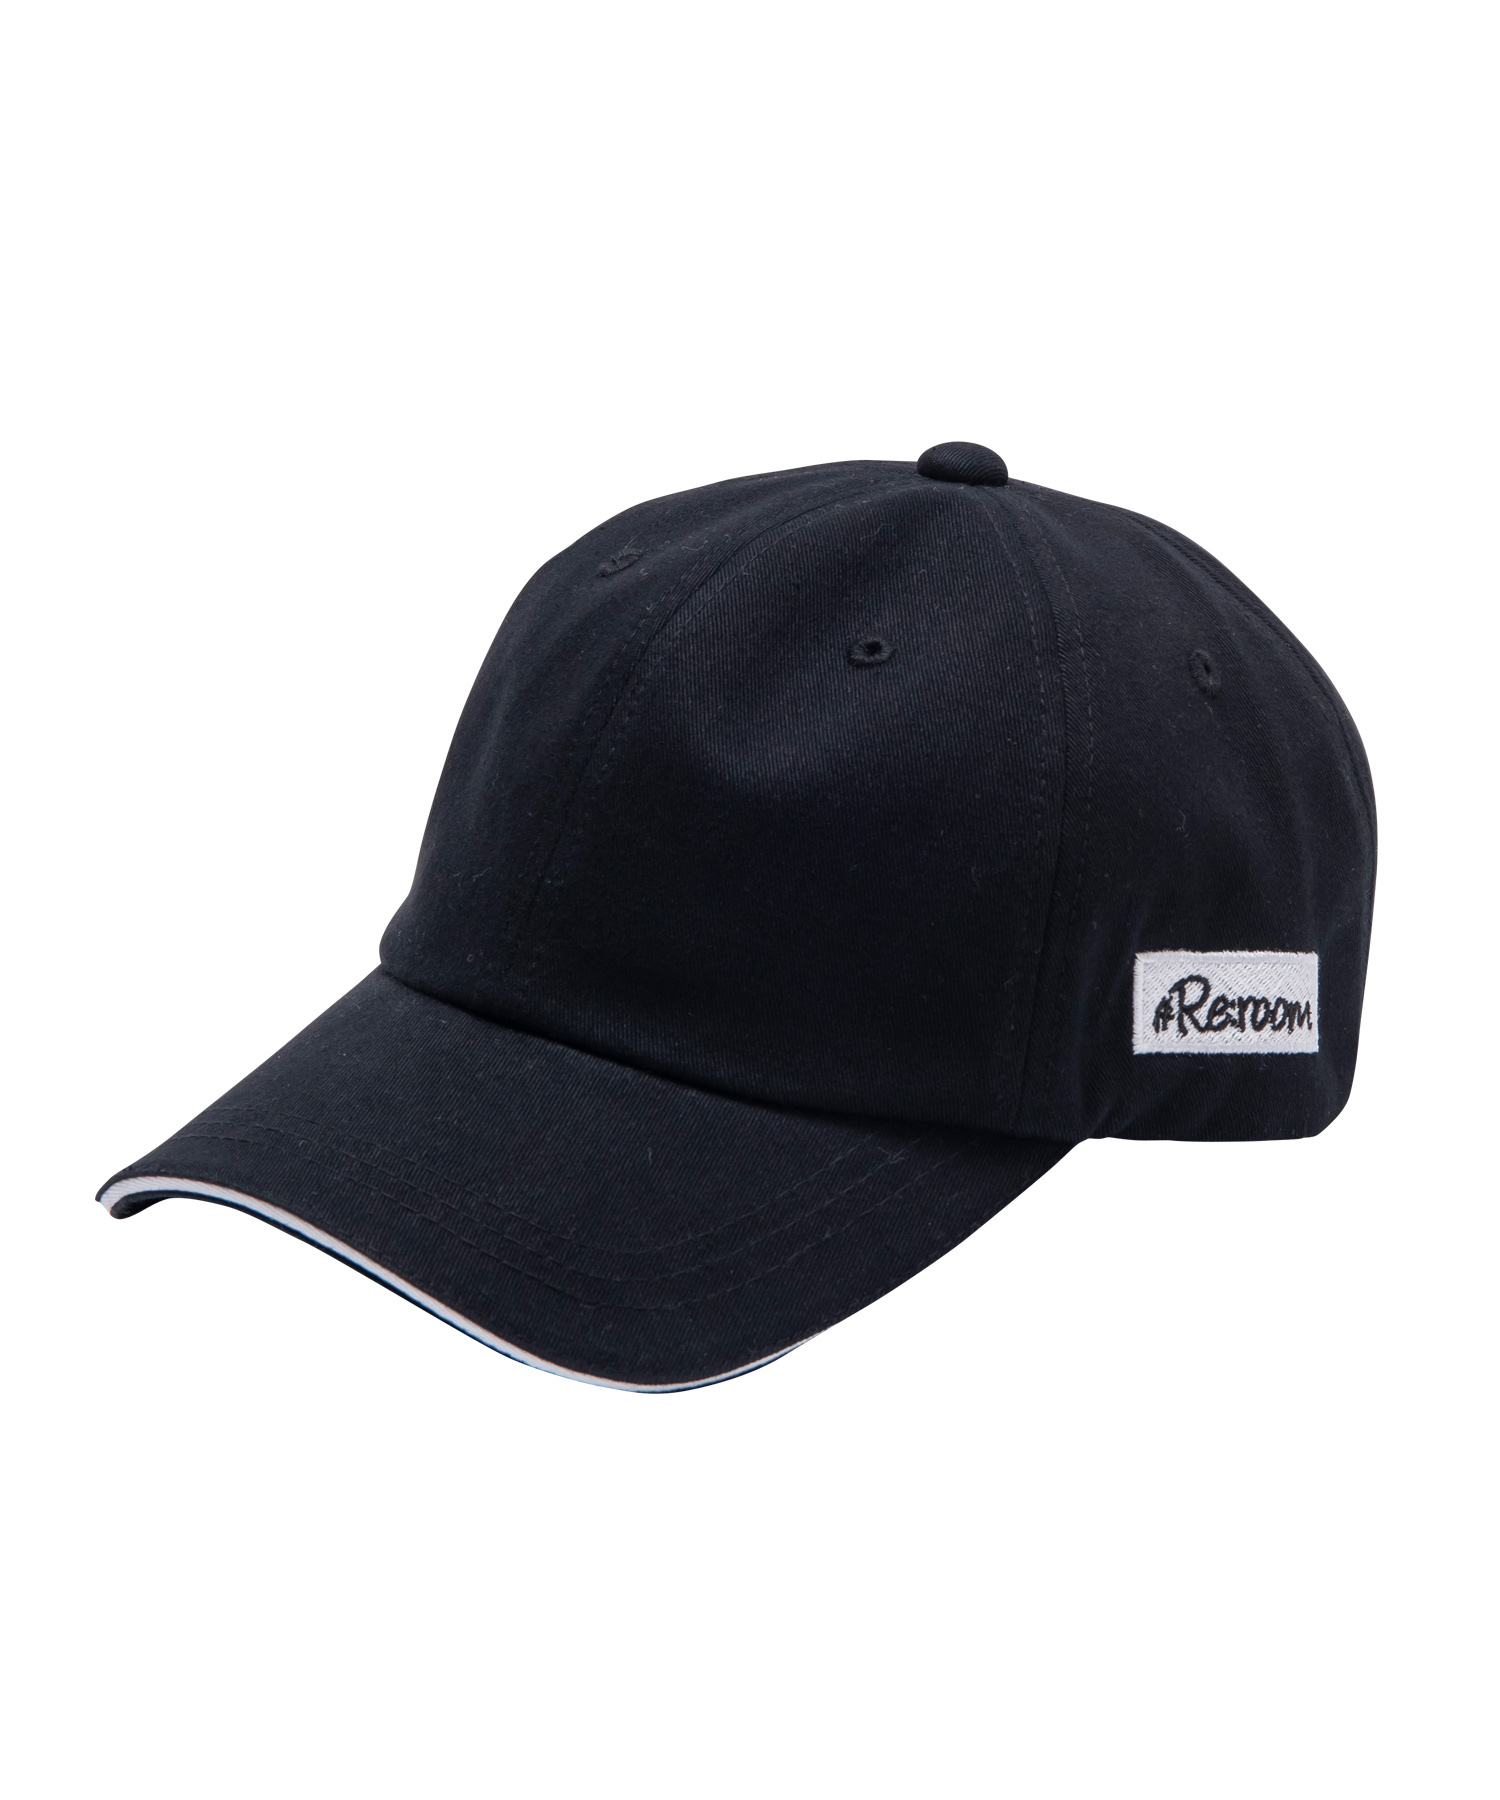 SIDE BOX LOGO TWILL CAP[REH070]